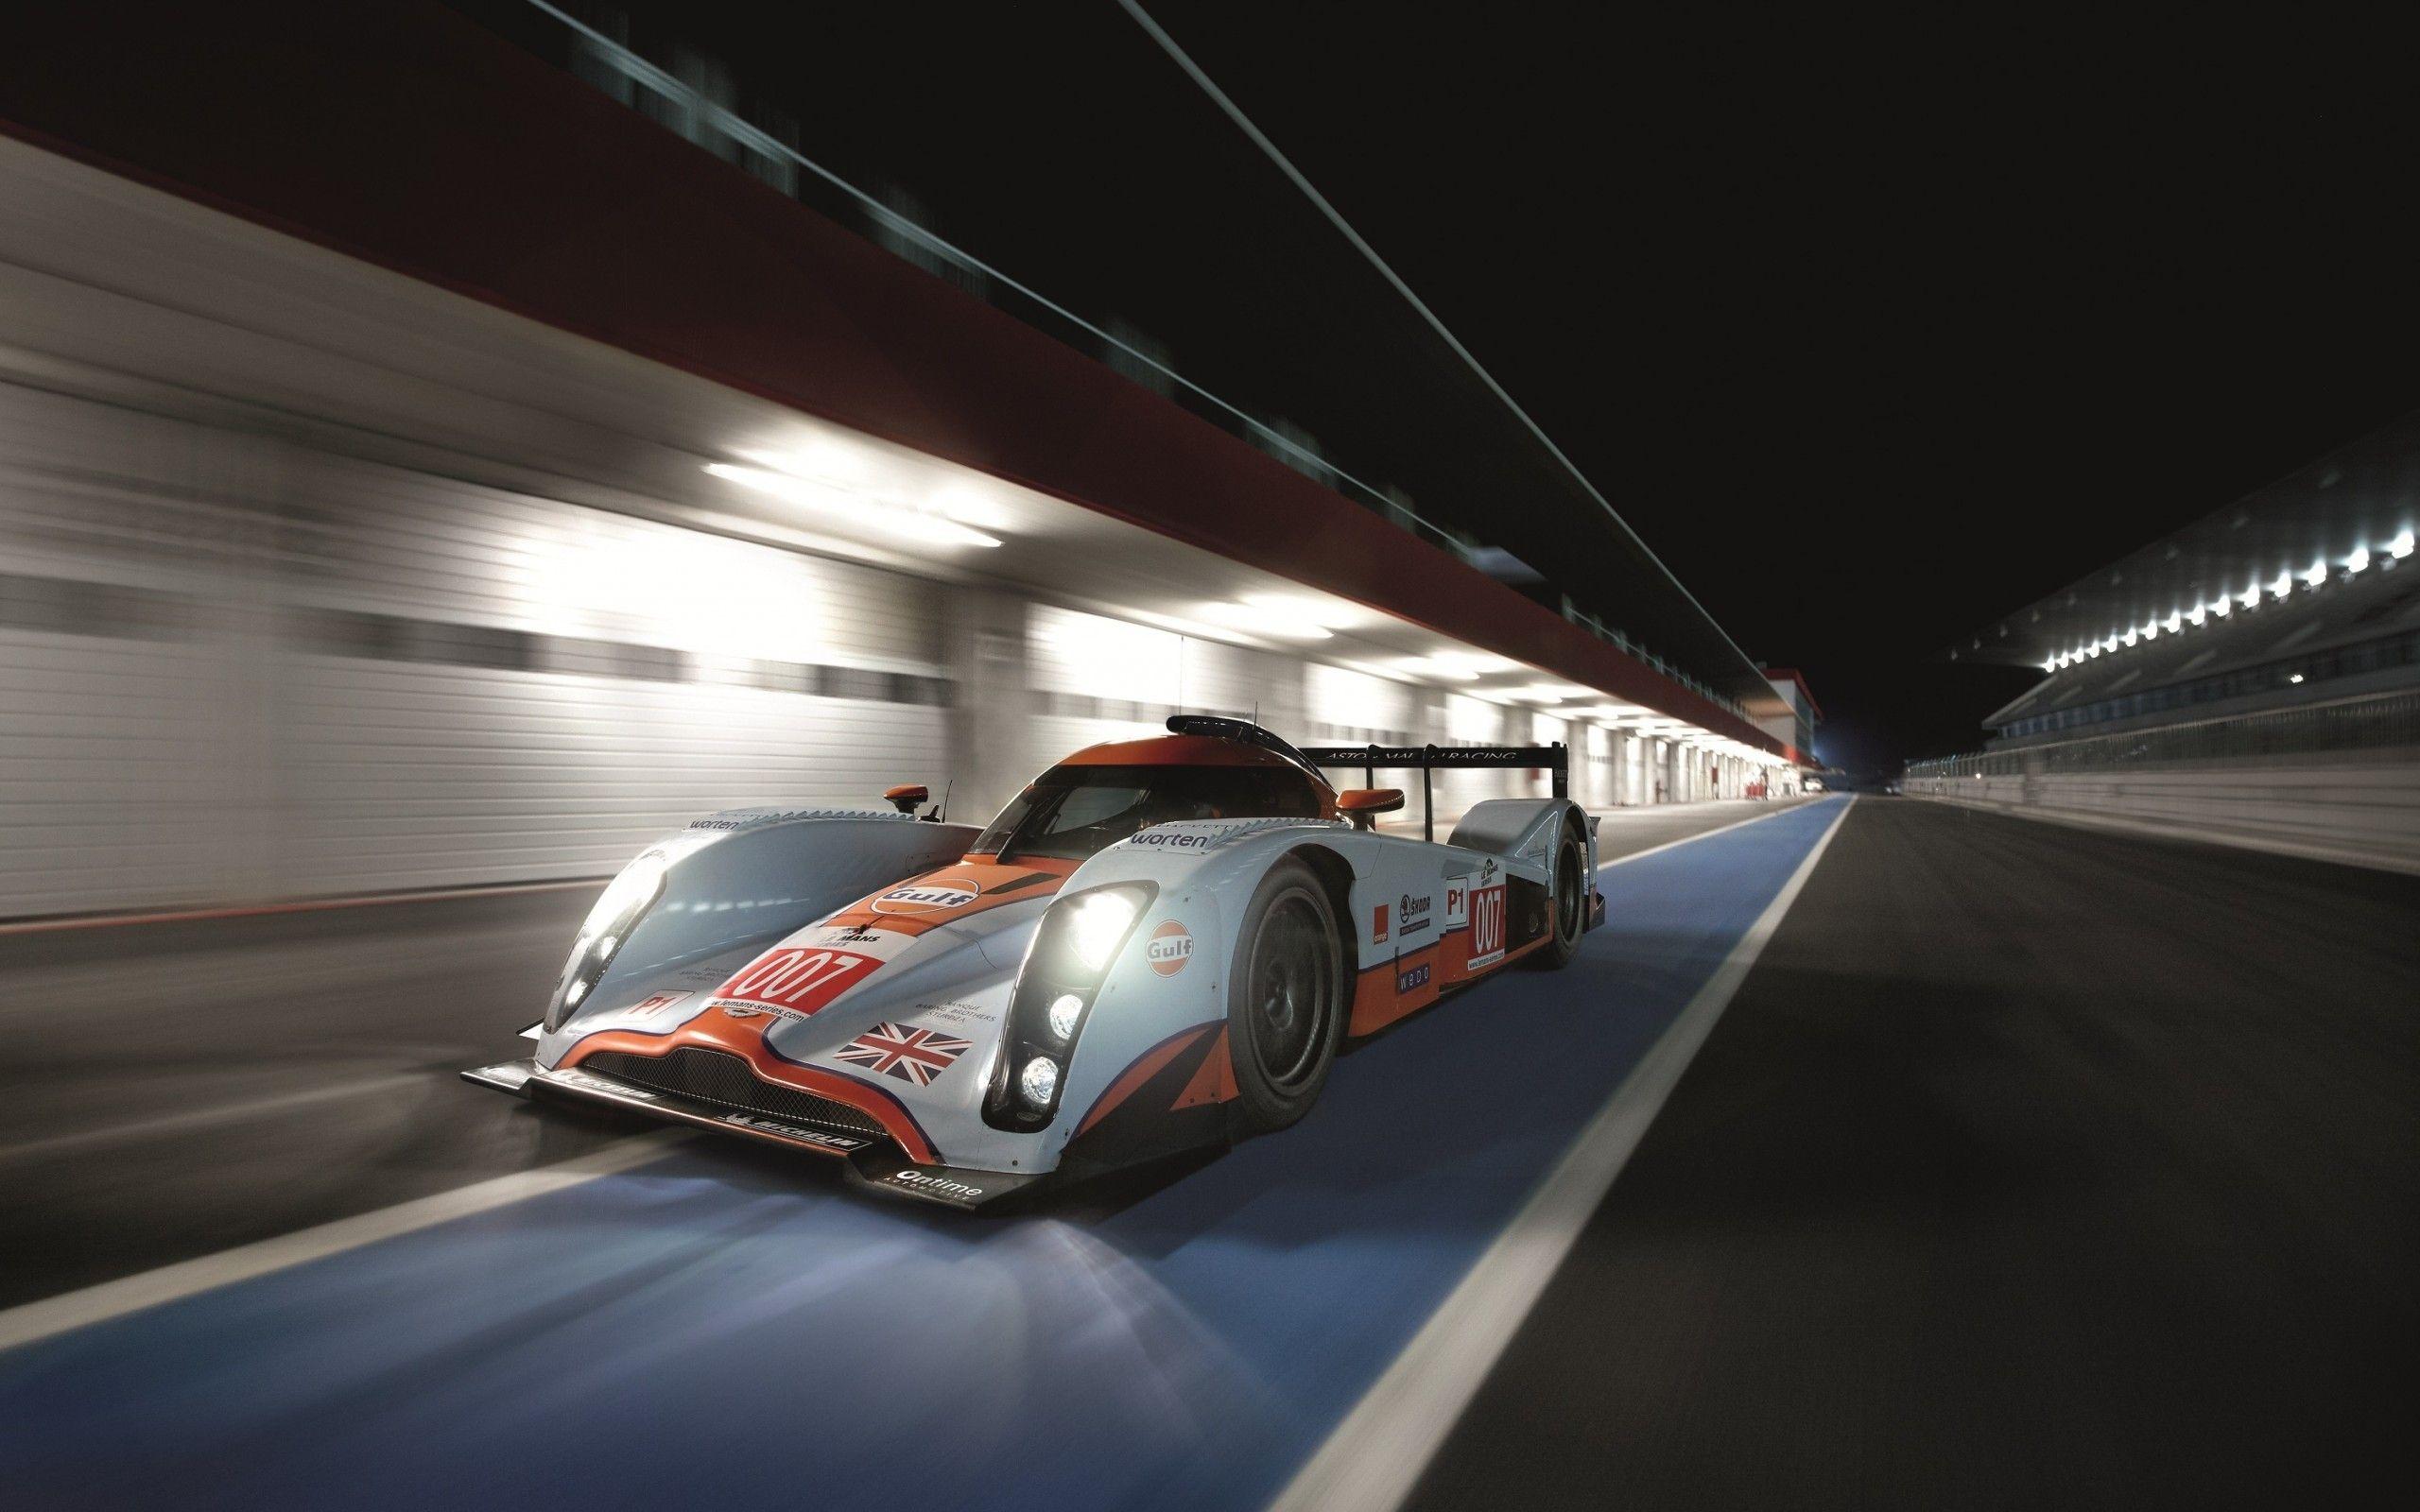 racing wallpaper hd